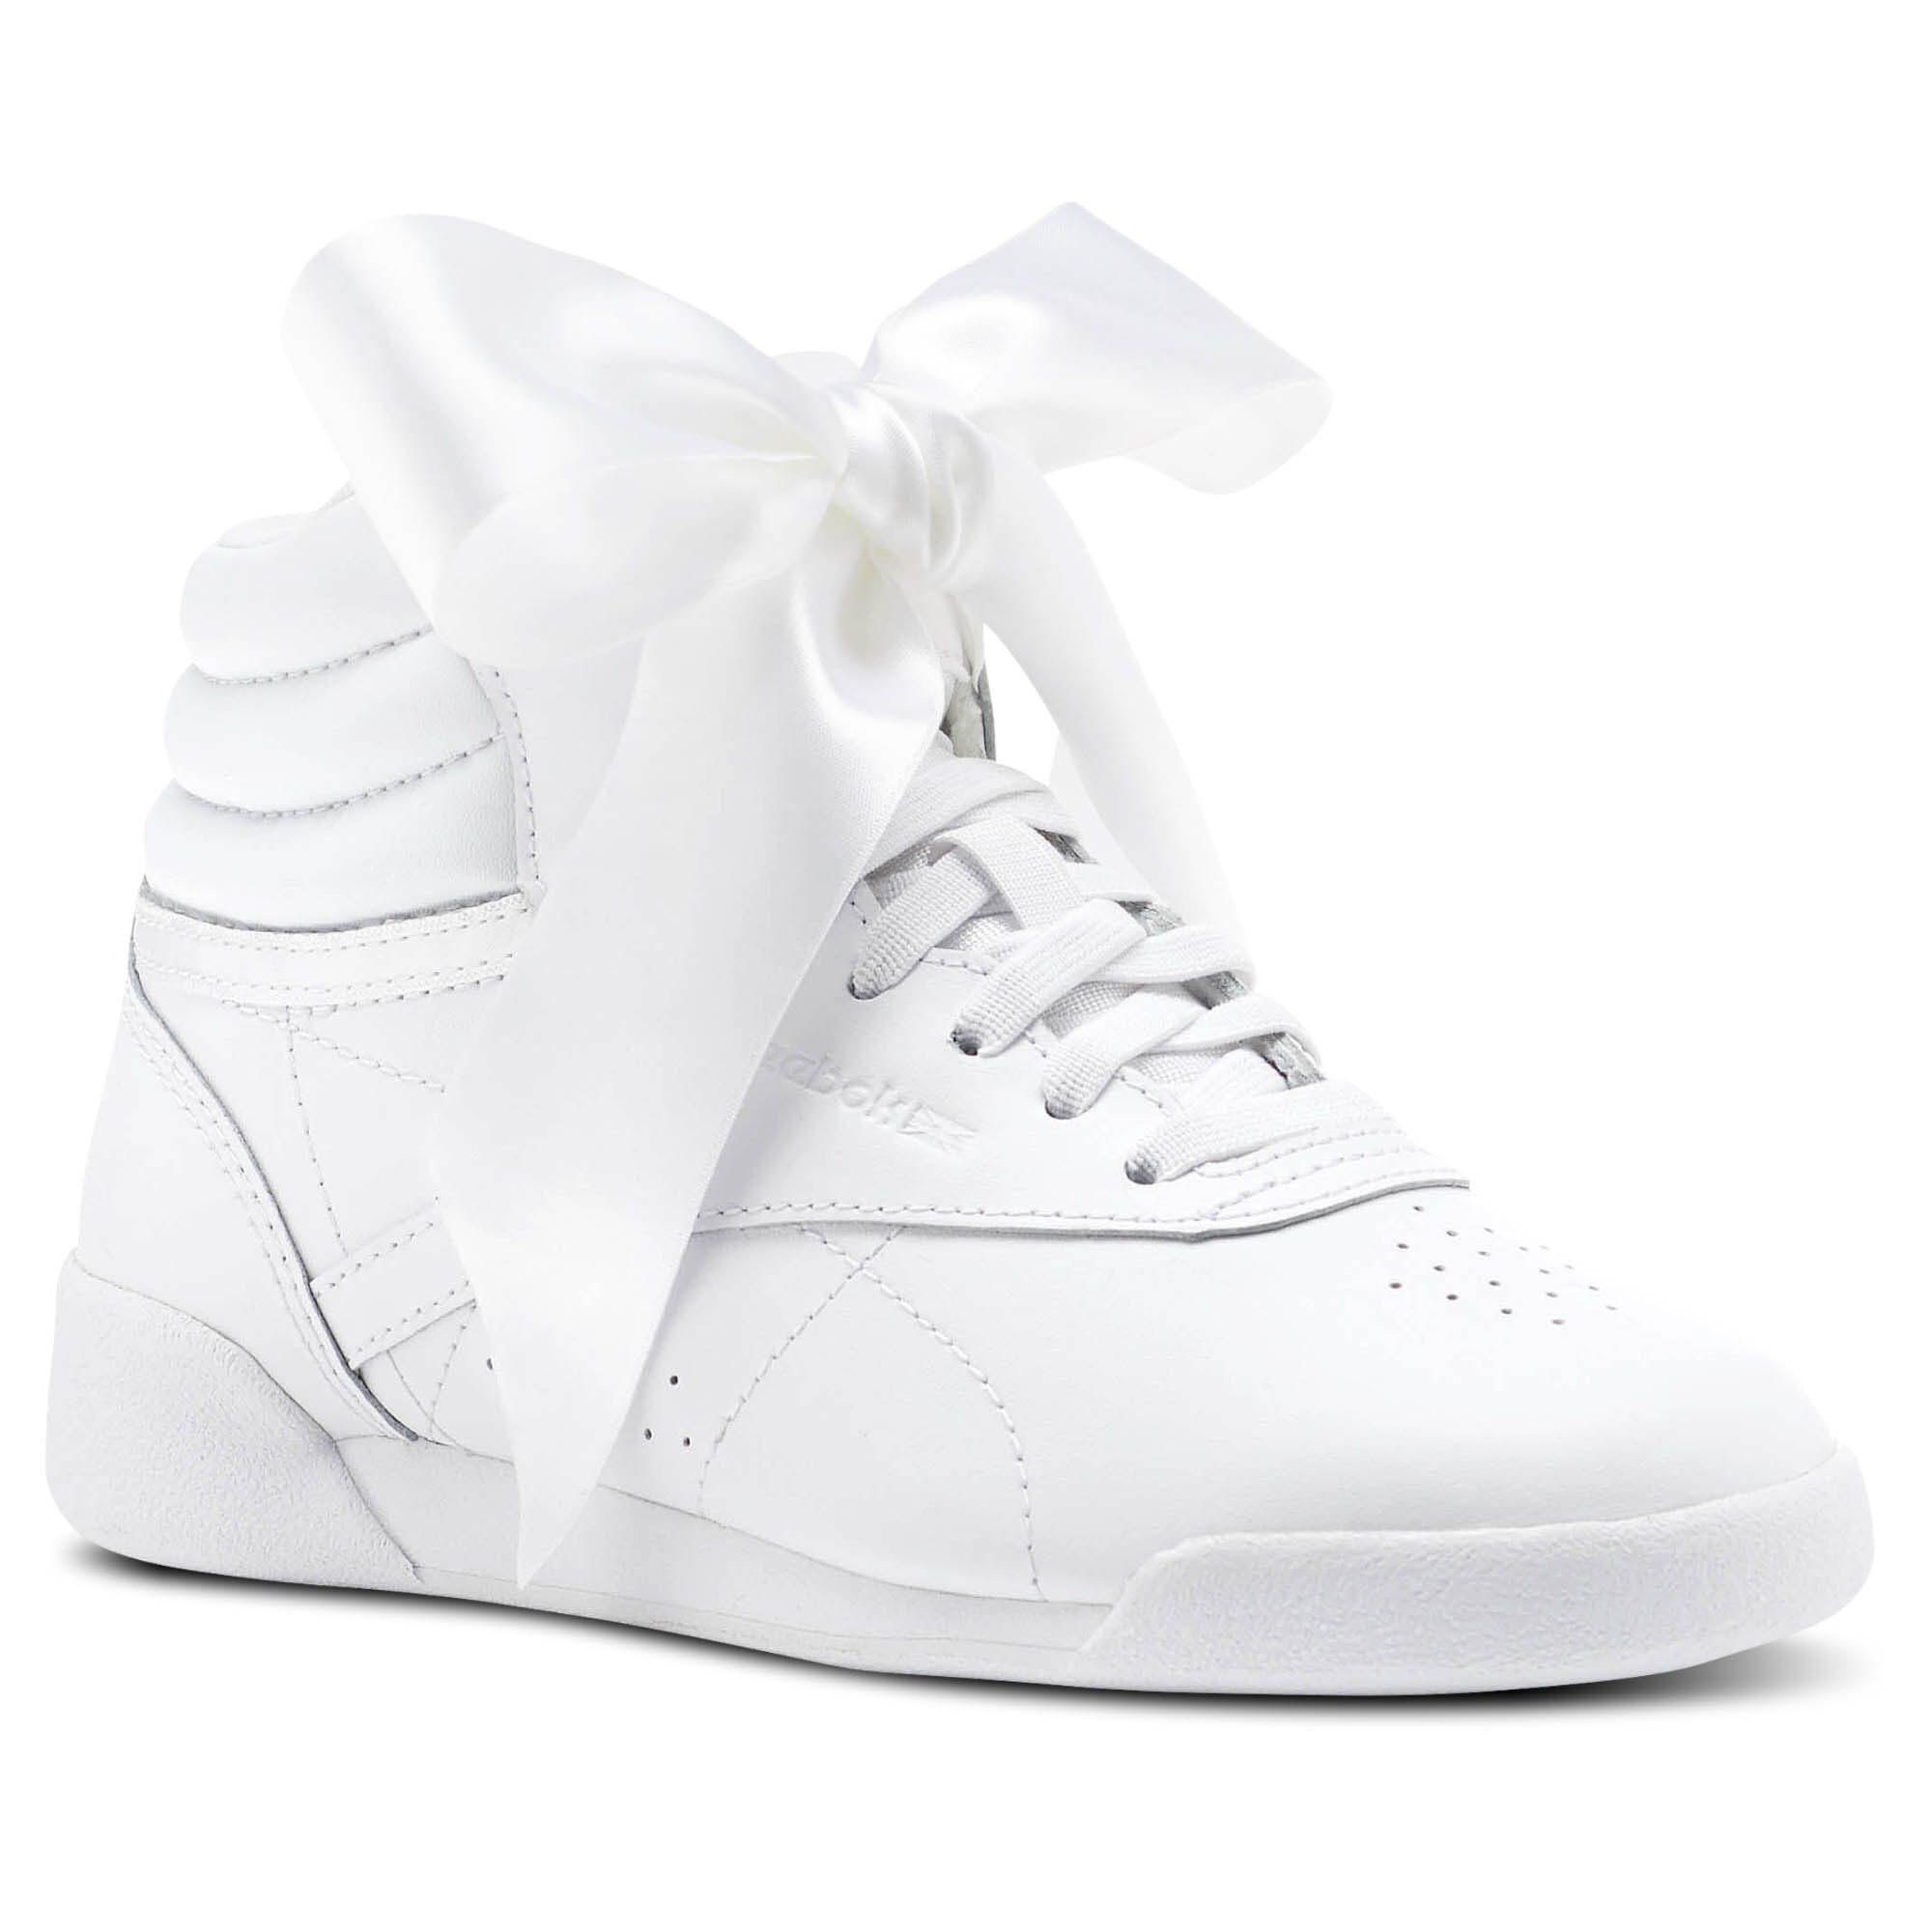 Boots homme - Noir-V.6 Espadrilles Femme Reebok Freestyle Hi Satin Bow White 6a26ca9c2682